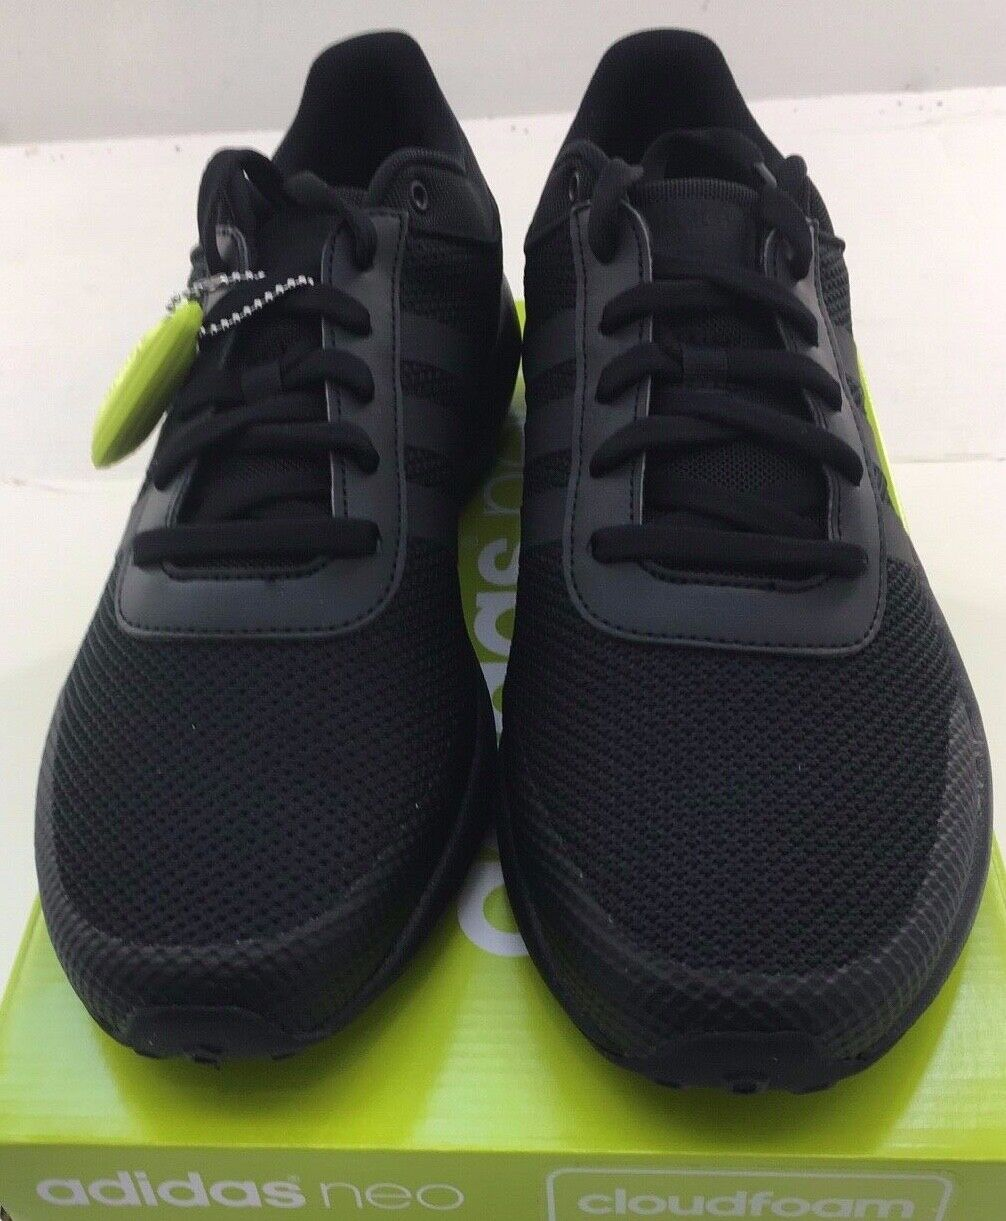 Mens Adidas NEO Cloudfoam Race Black Sneaker Athletic Sport Shoes B74372 7 14